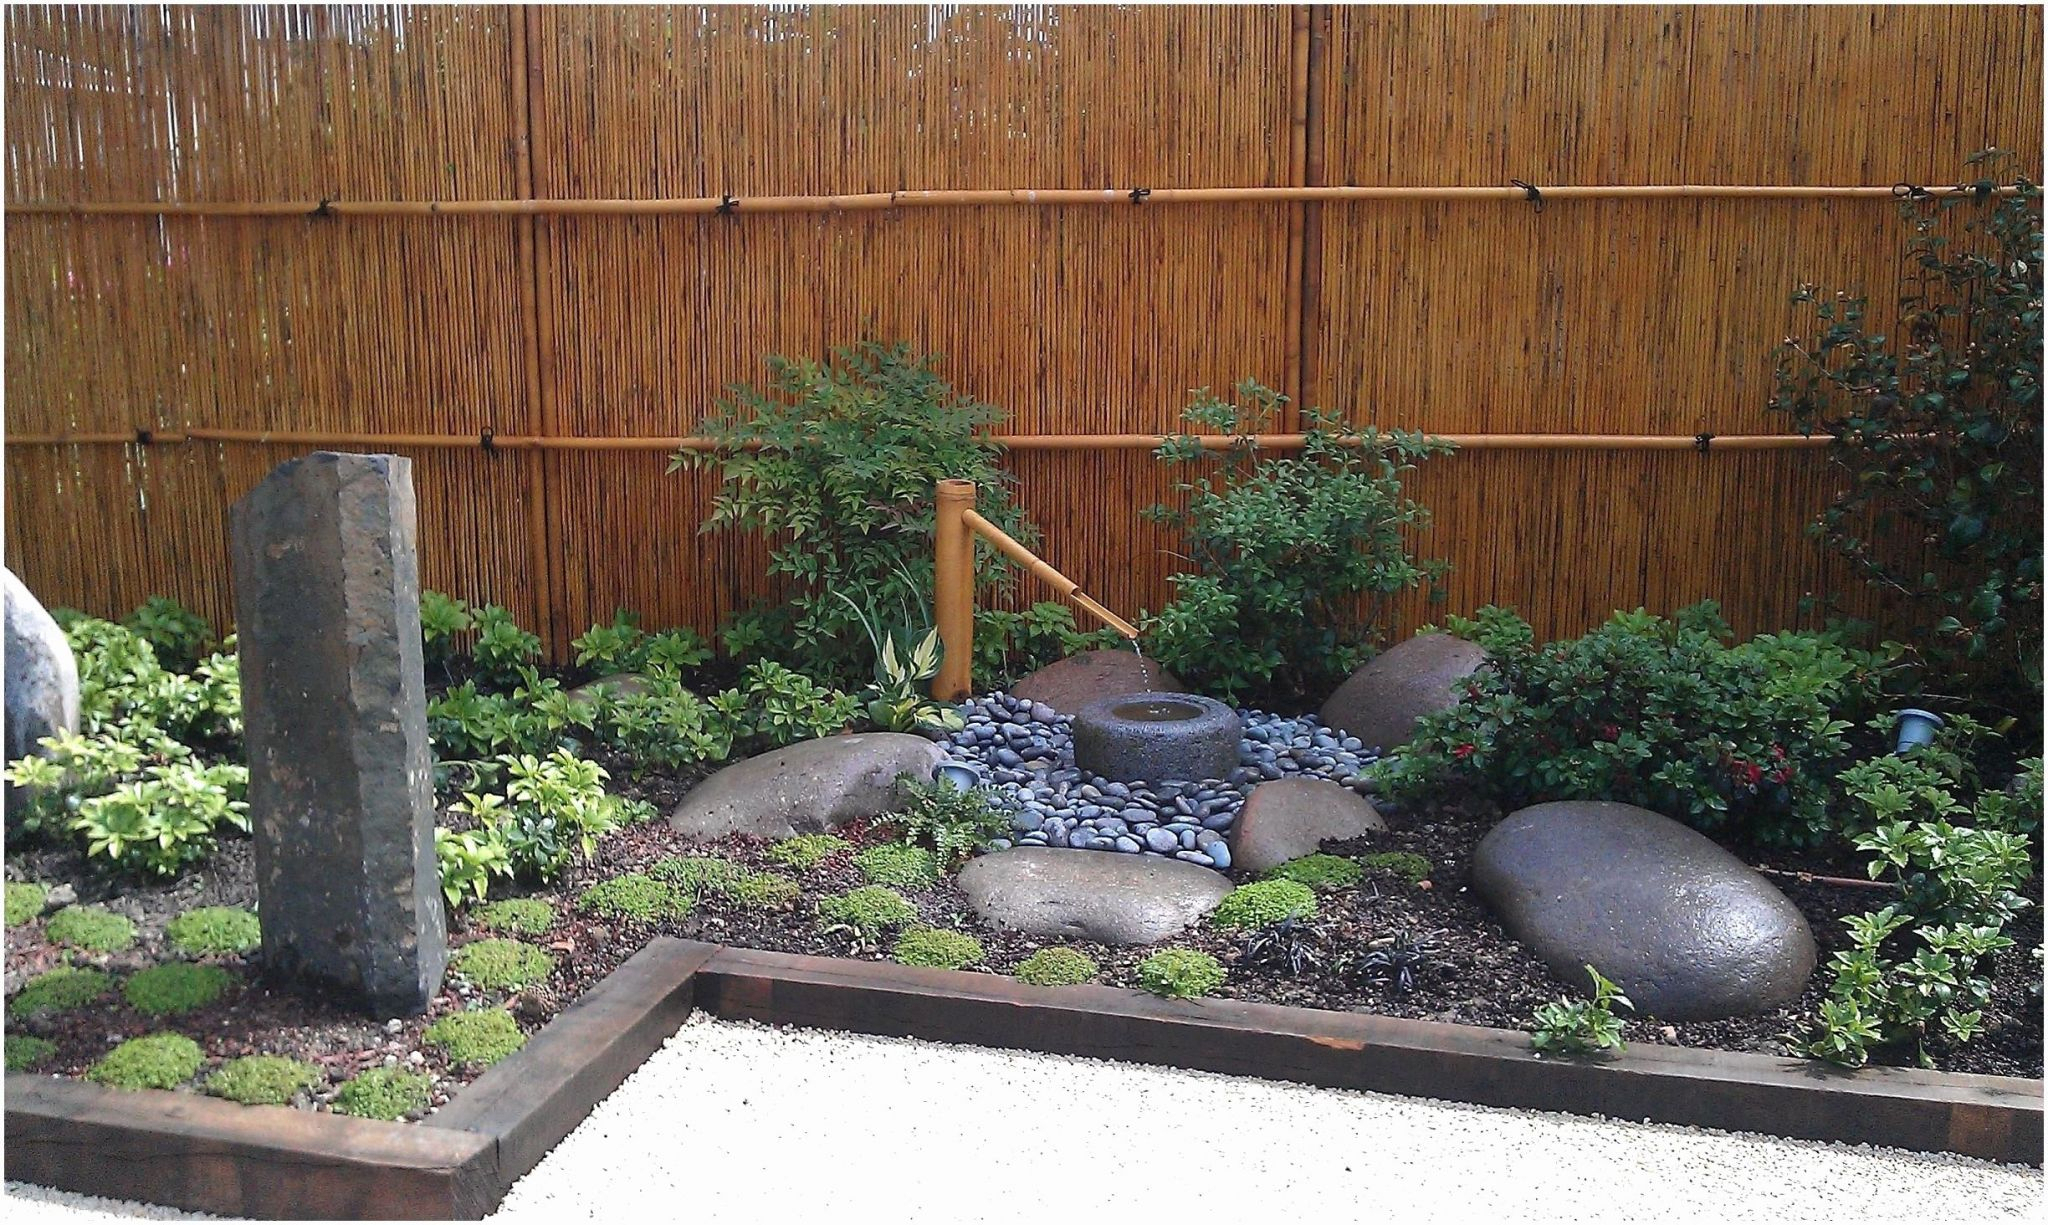 Jardin Zen Exterieur Creer Un Coin Zen Dans Son Jardin Et ... serapportantà Decor Jardin Zen